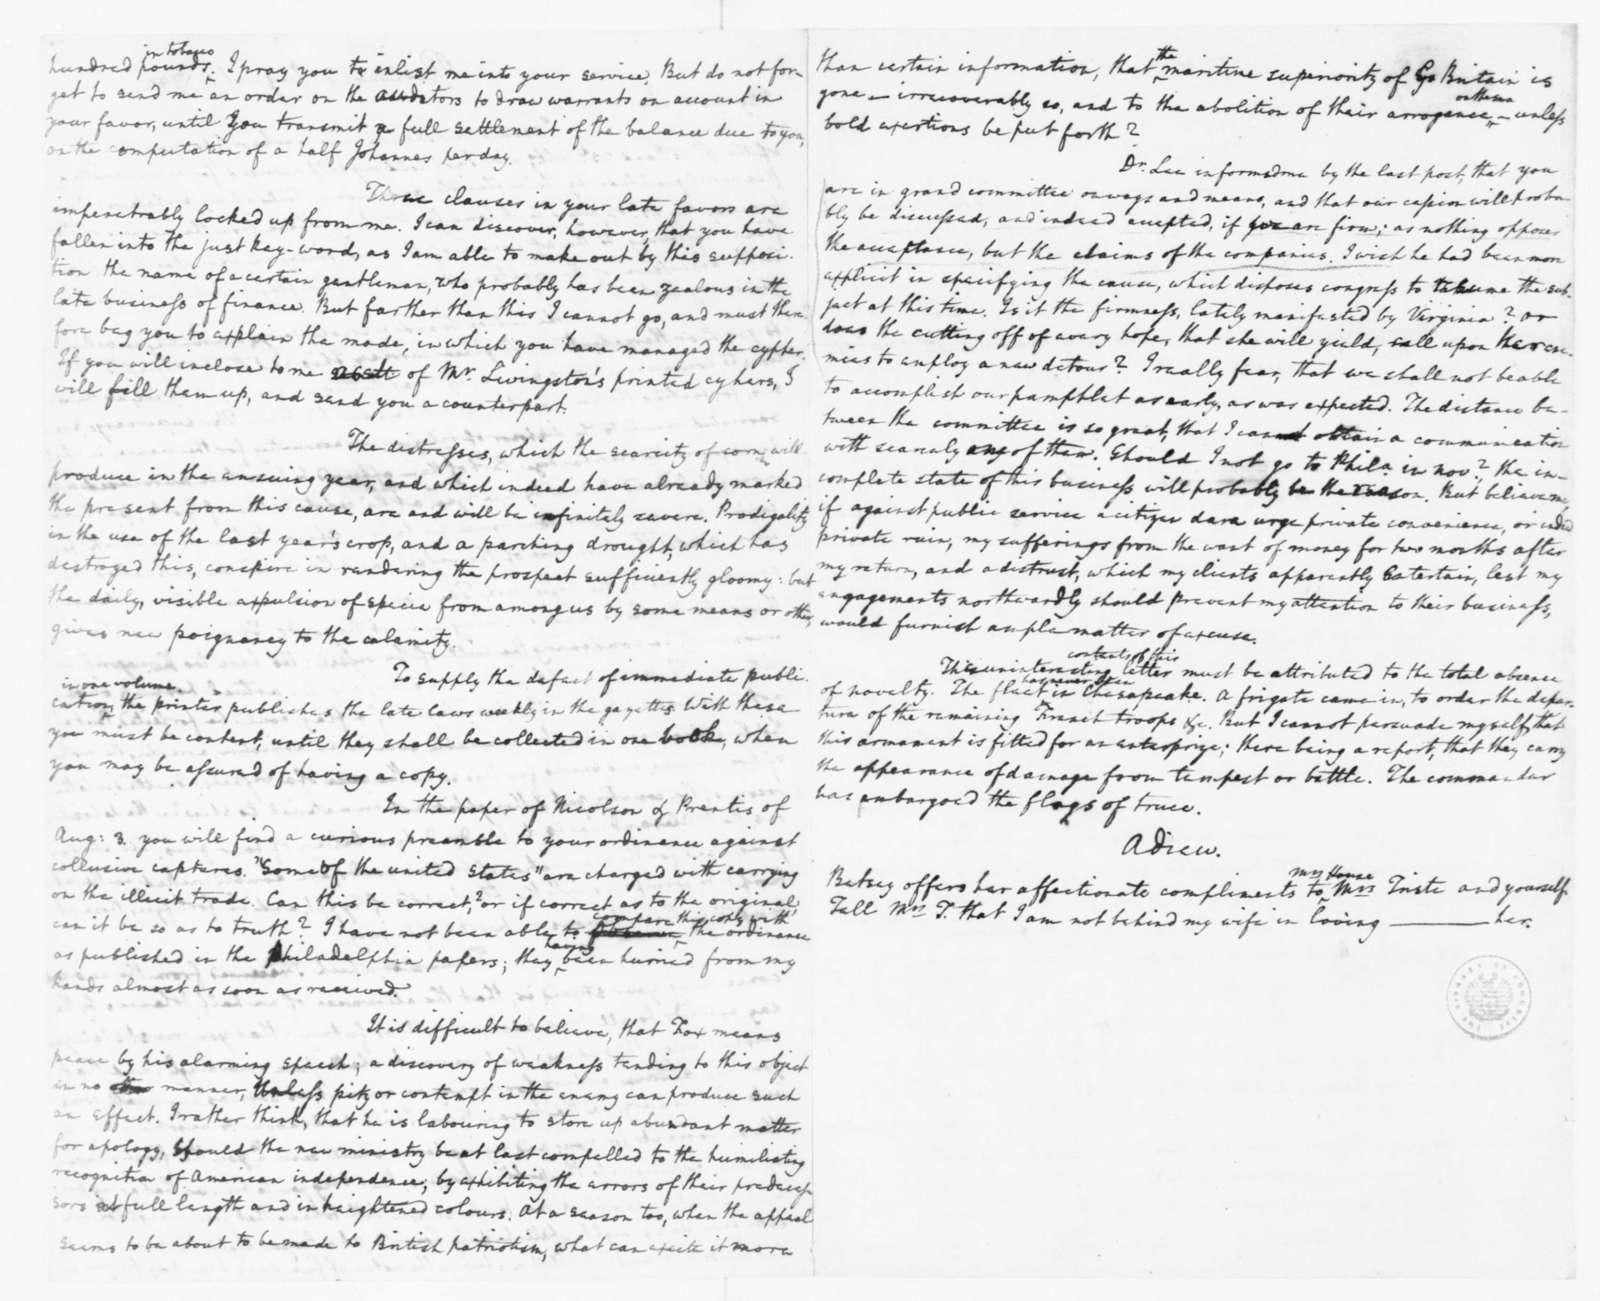 Edmund Randolph to James Madison, August 6, 1782.